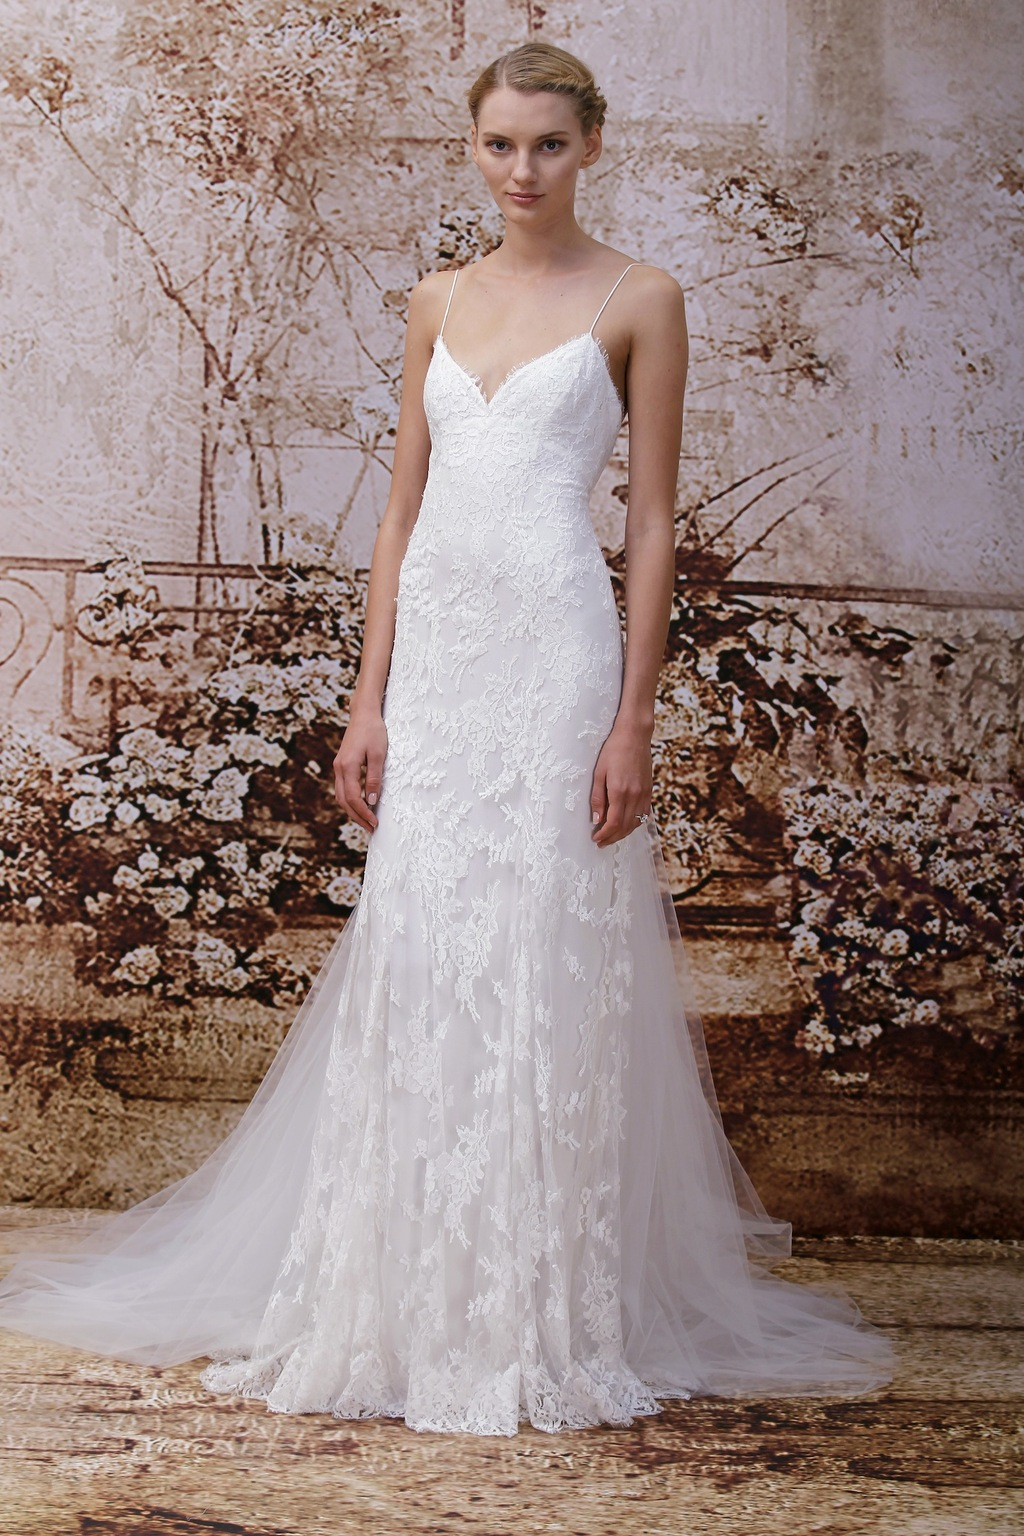 Wedding-dress-by-monique-lhuillier-fall-2014-bridal-look-9.full